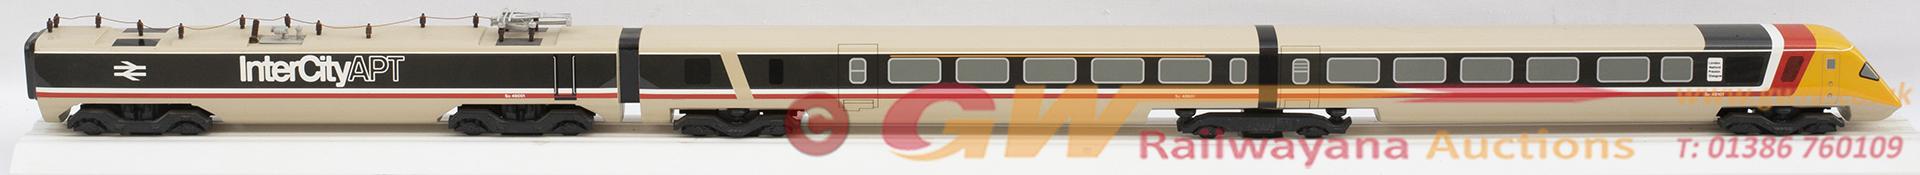 Travel Agents Display Model Of British Railways